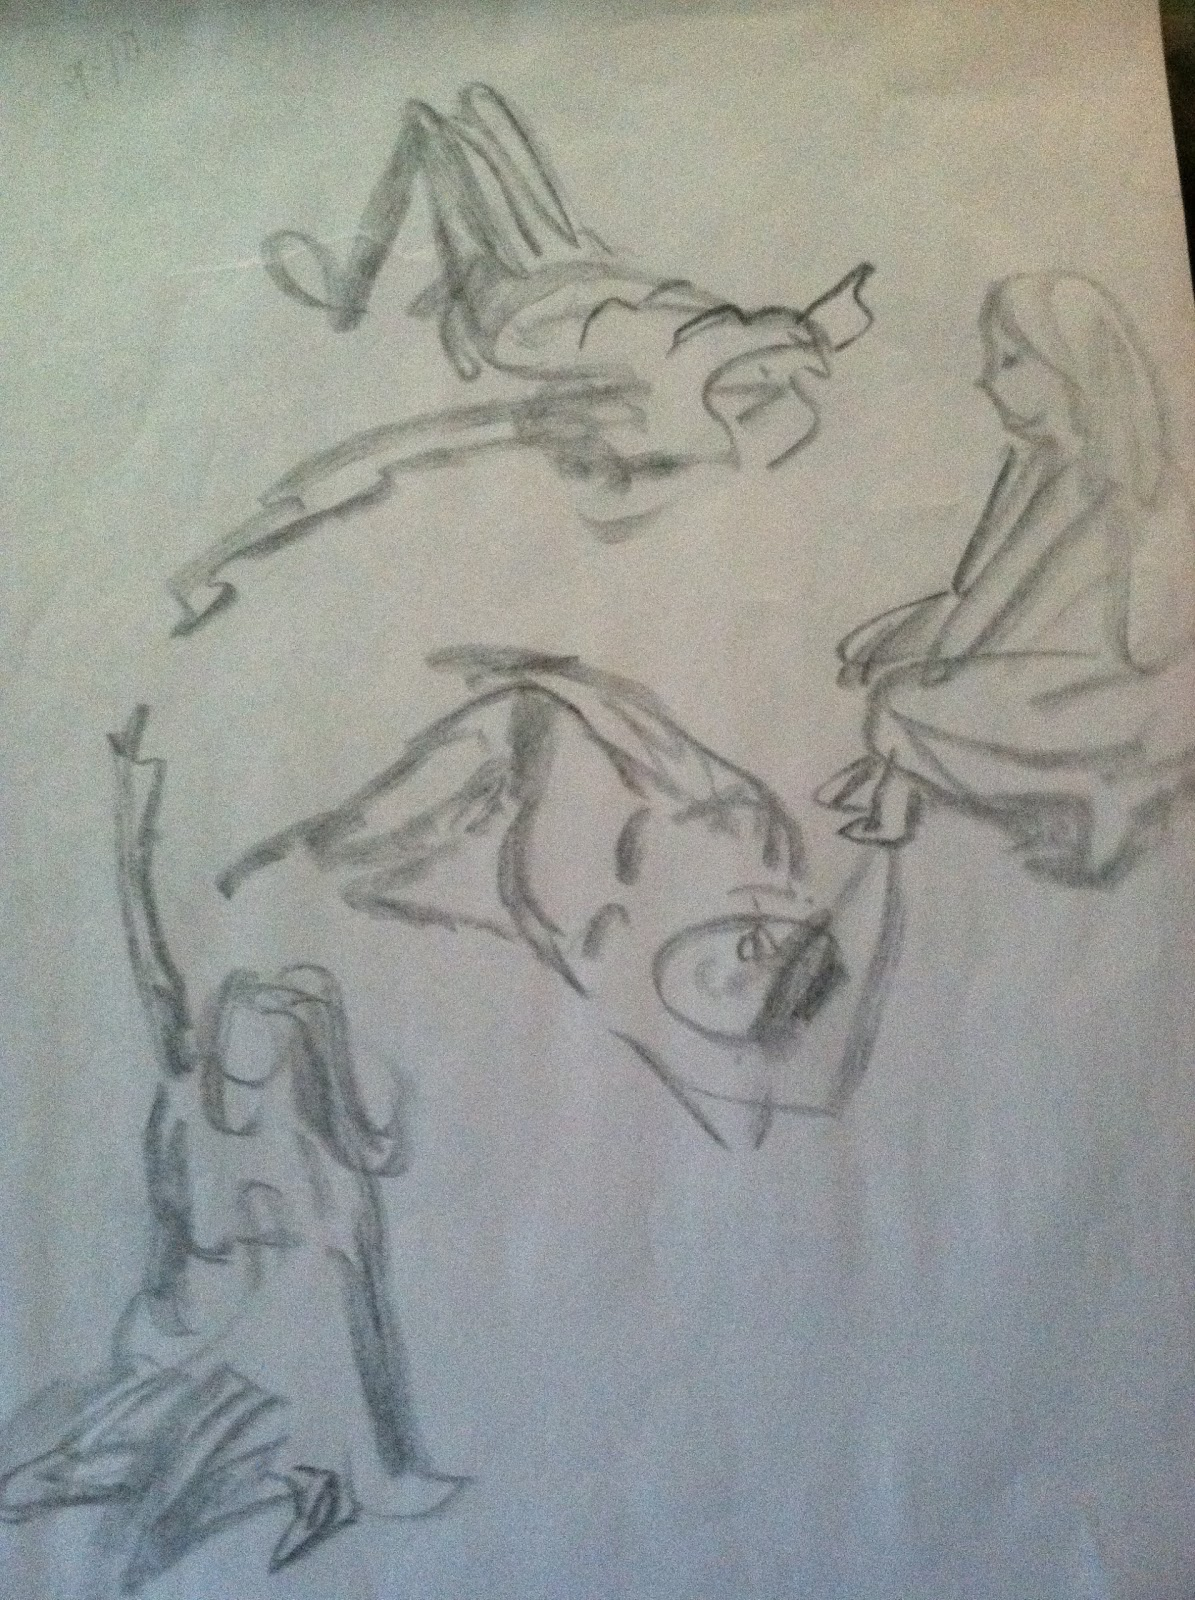 Scribble Gesture Drawing : Education in creativity figure drawing the gesture